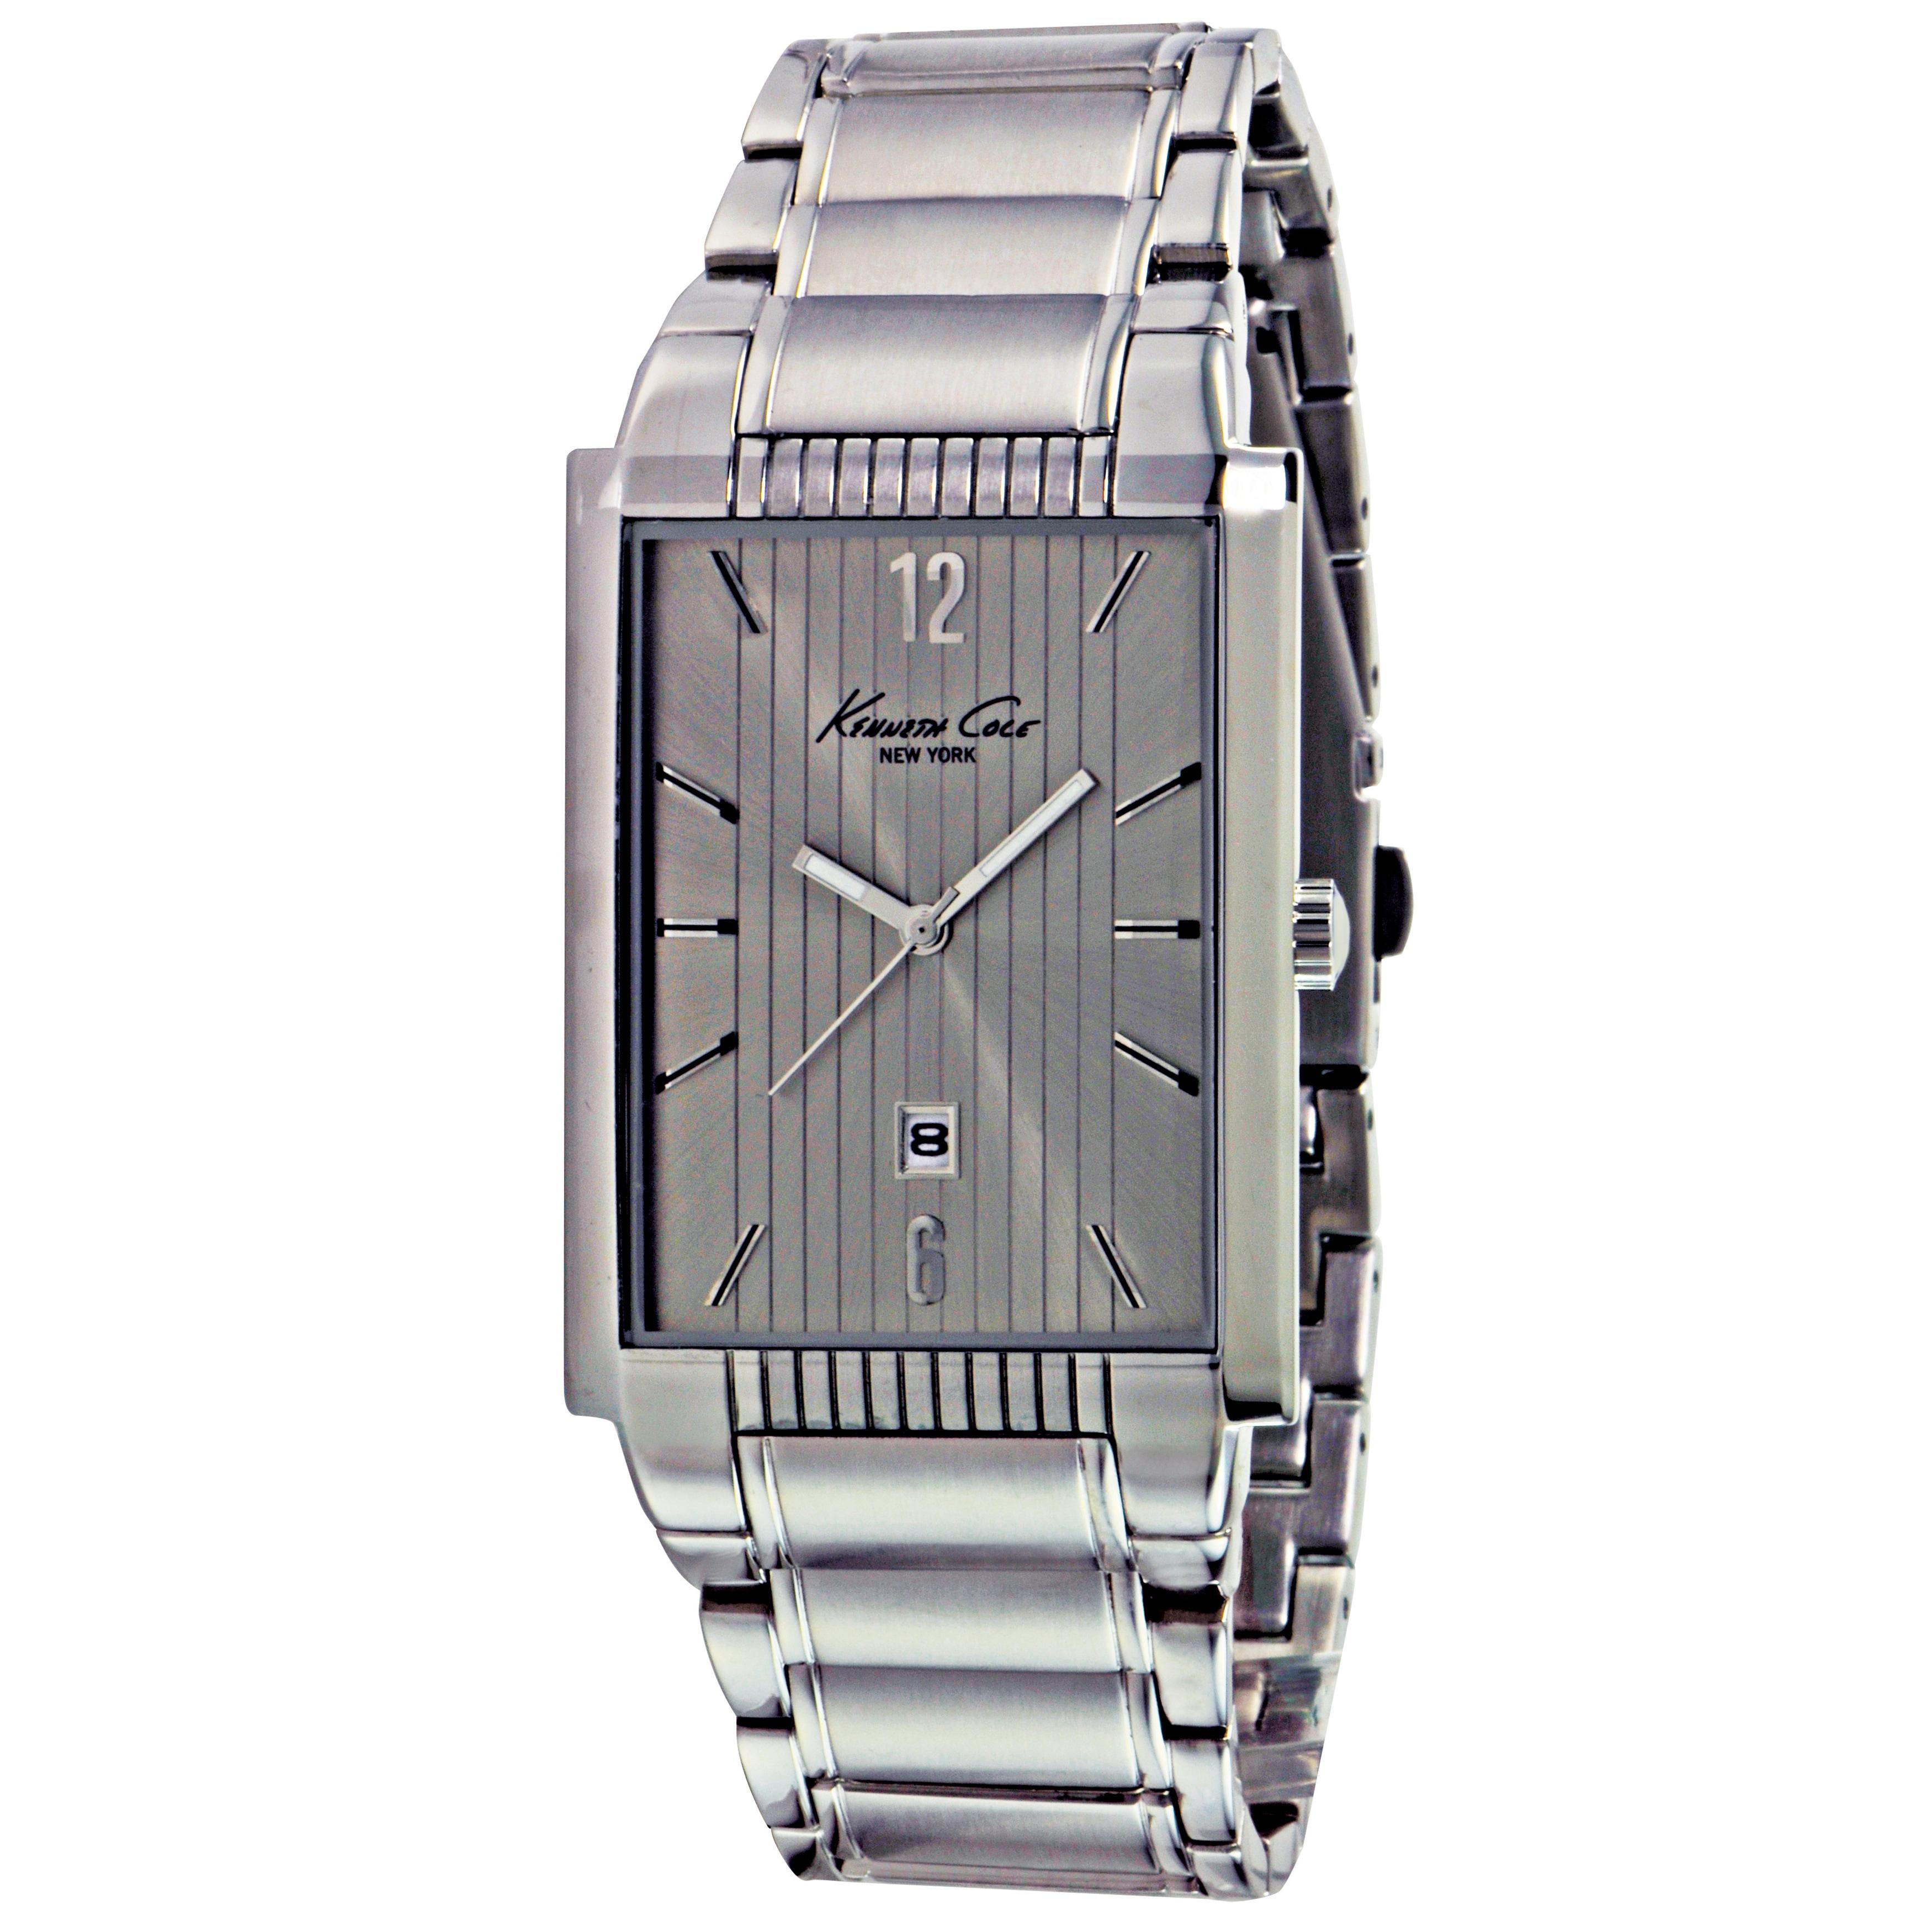 Kenneth Cole New York Men's Rectangular Pinstripe Watch